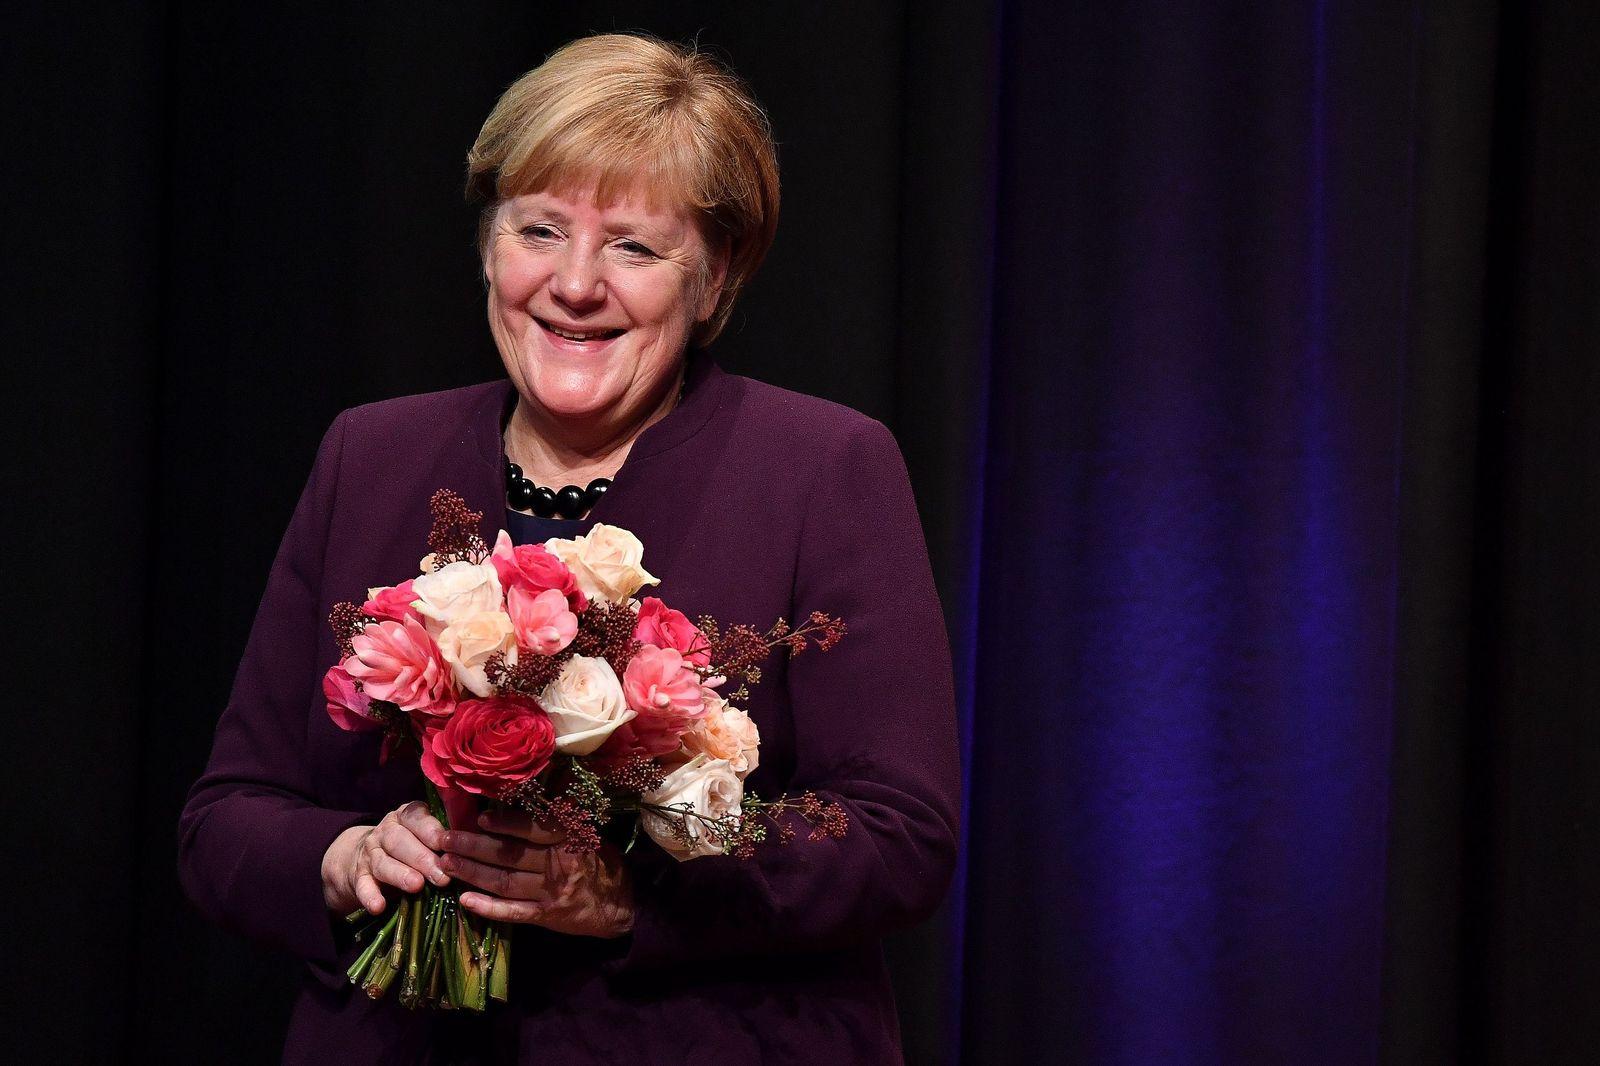 Angela Merkel receives Theodor-Herzl-Prize, Munich, Germany - 28 Oct 2019